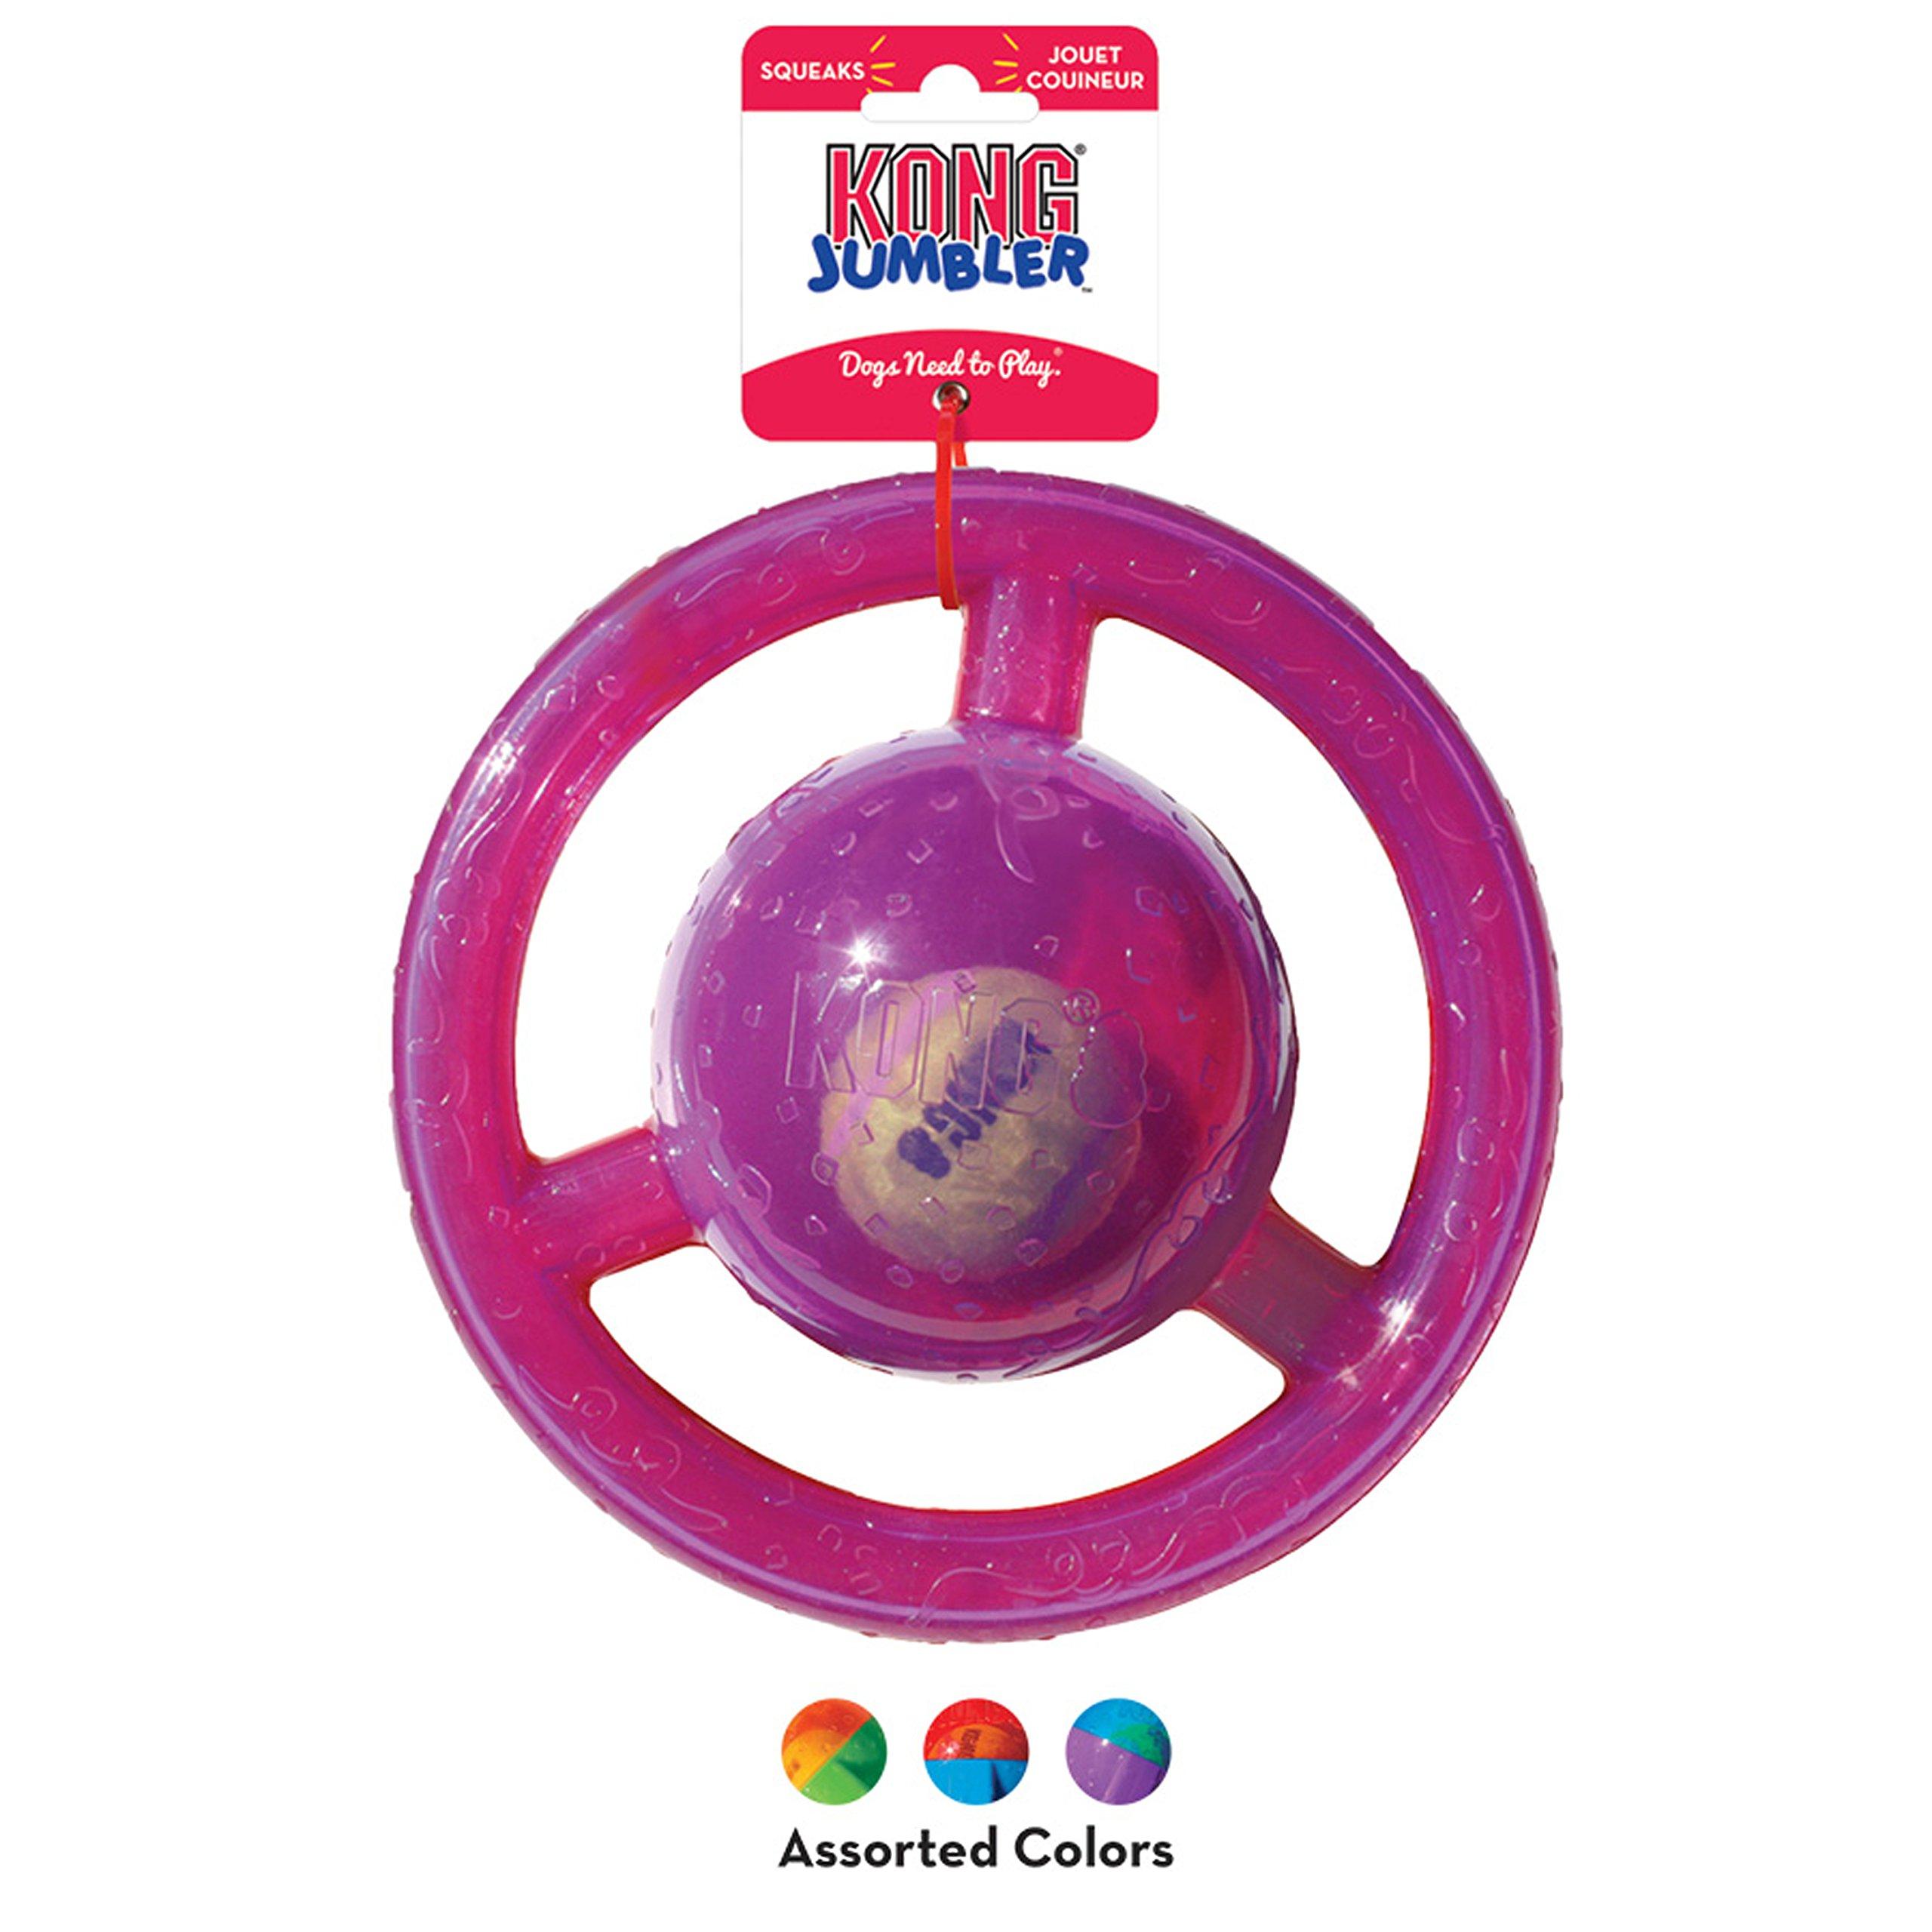 KONG Jumbler Disc Dog Toy, Medium/Large by KONG (Image #4)